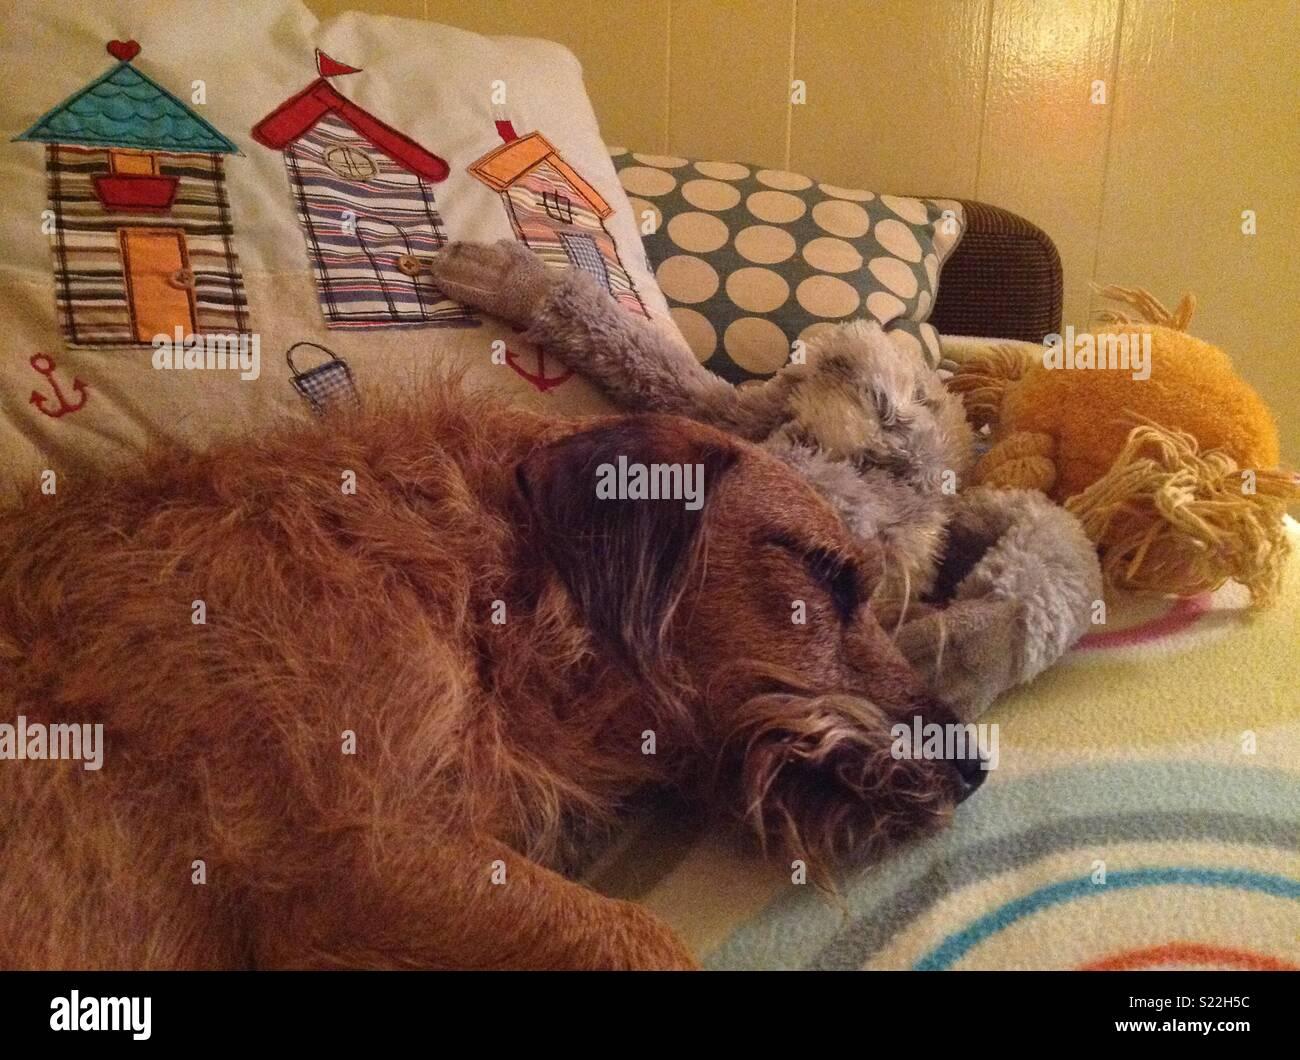 Dog asleep with toys - Stock Image